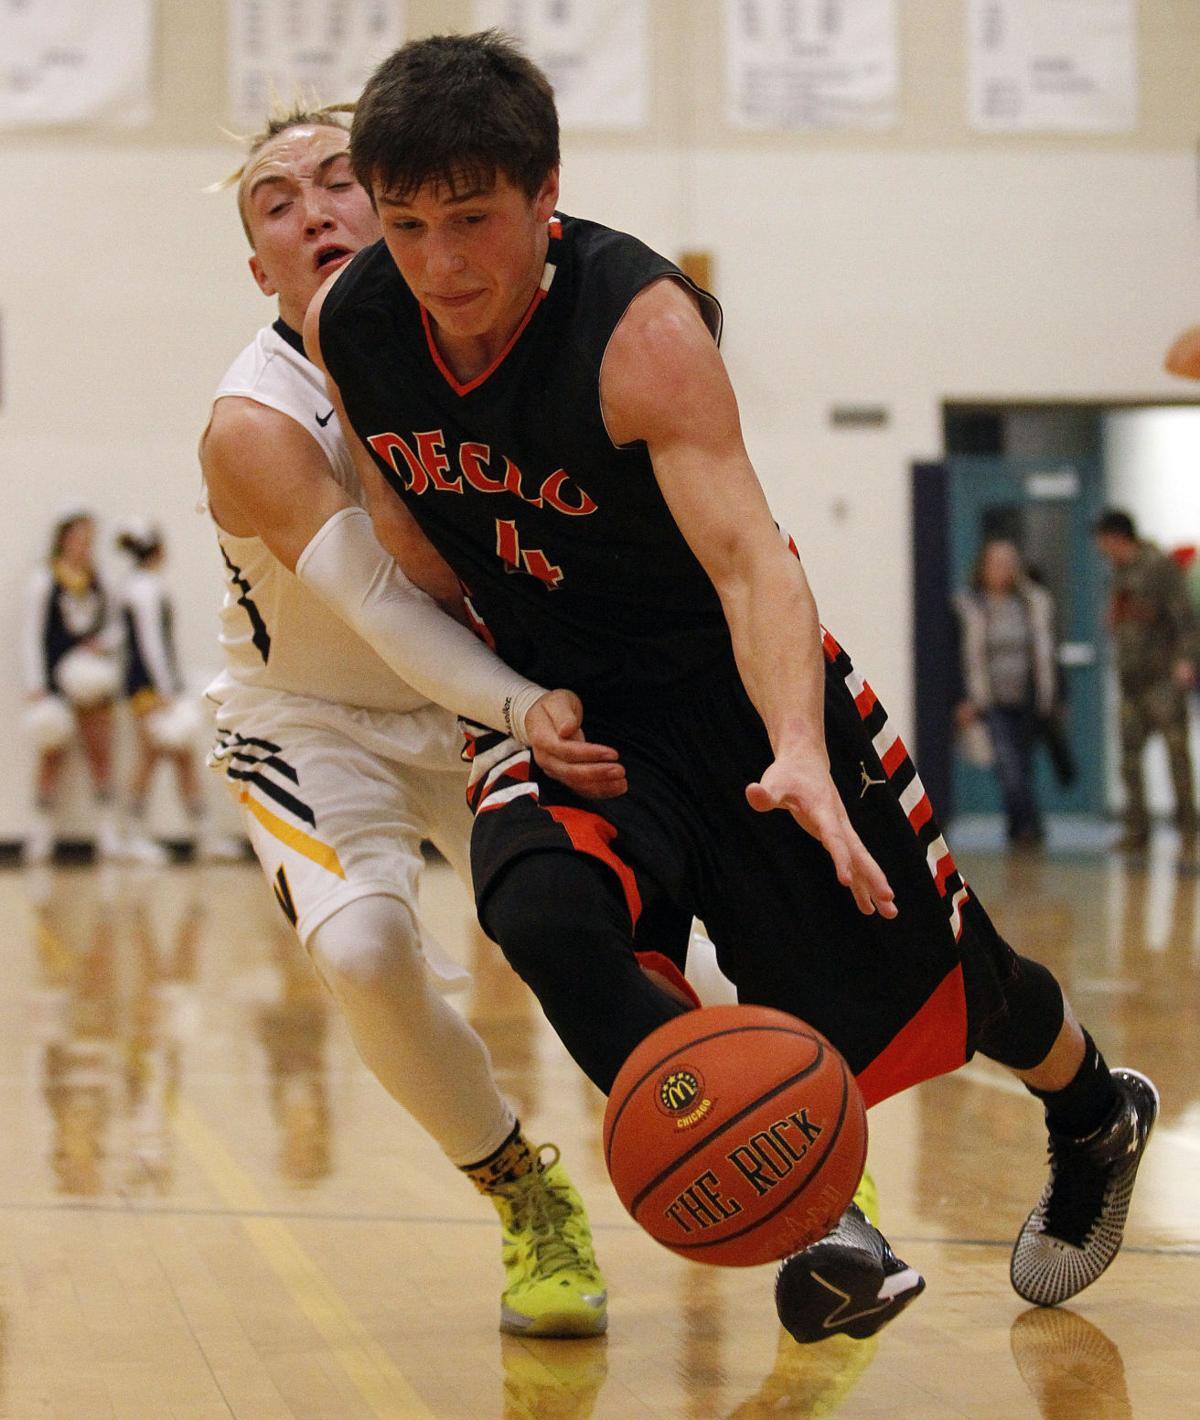 Boys Basketball - Declo Vs. Wendell